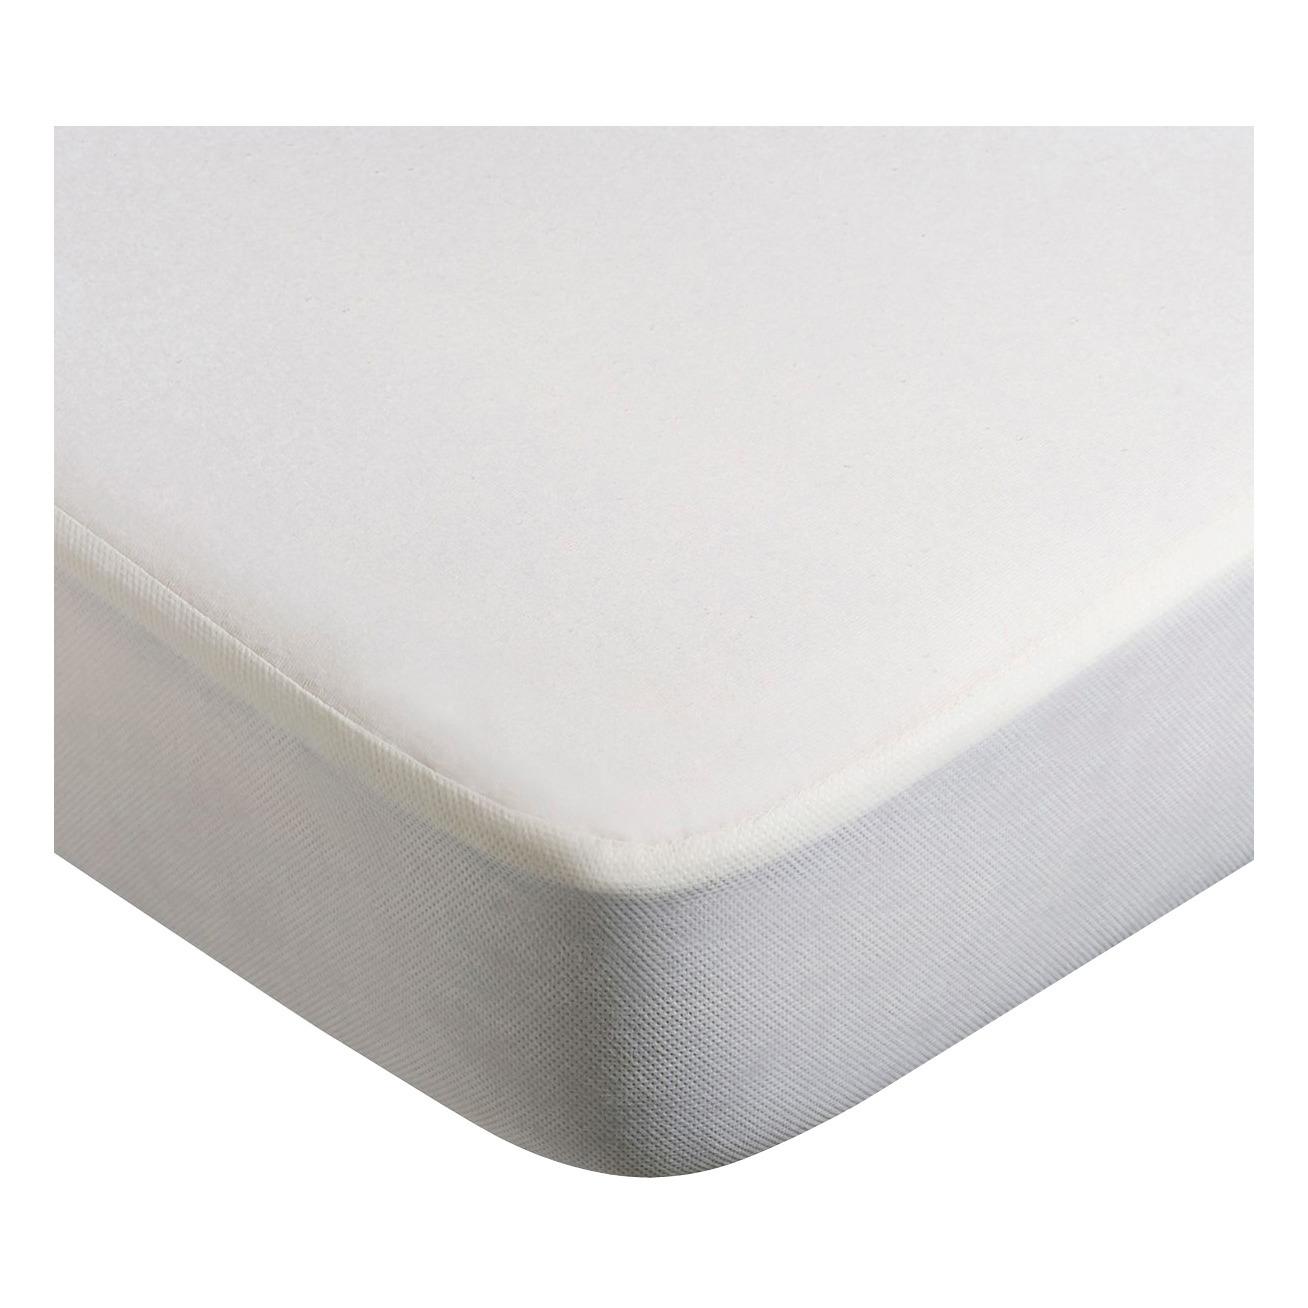 Kumi Cradle Bamboo Mattress Protector White Charlie Crane Design